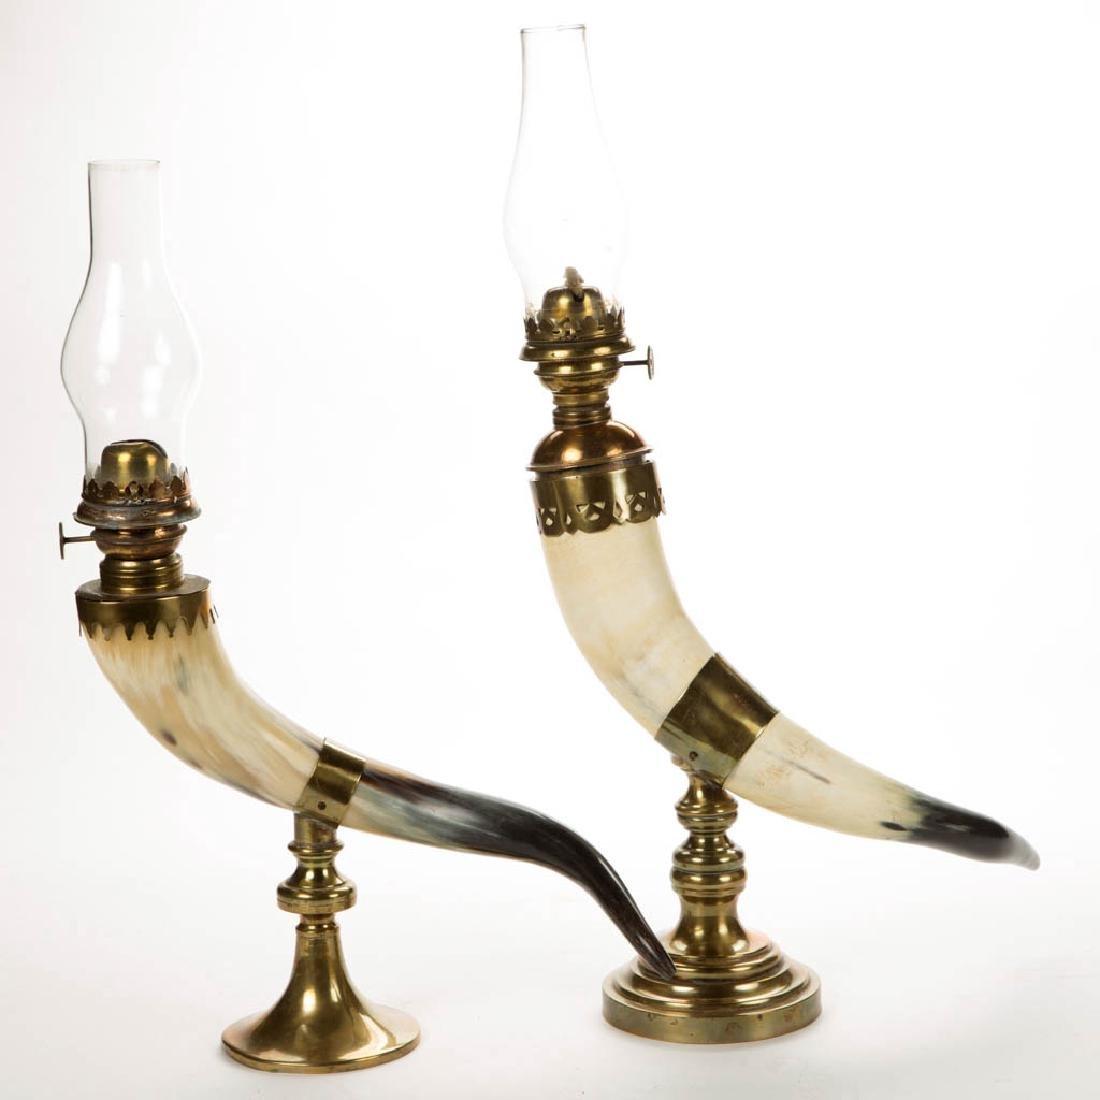 BRASS AND POWDER HORN KEROSENE LAMPS, LOT OF TWO